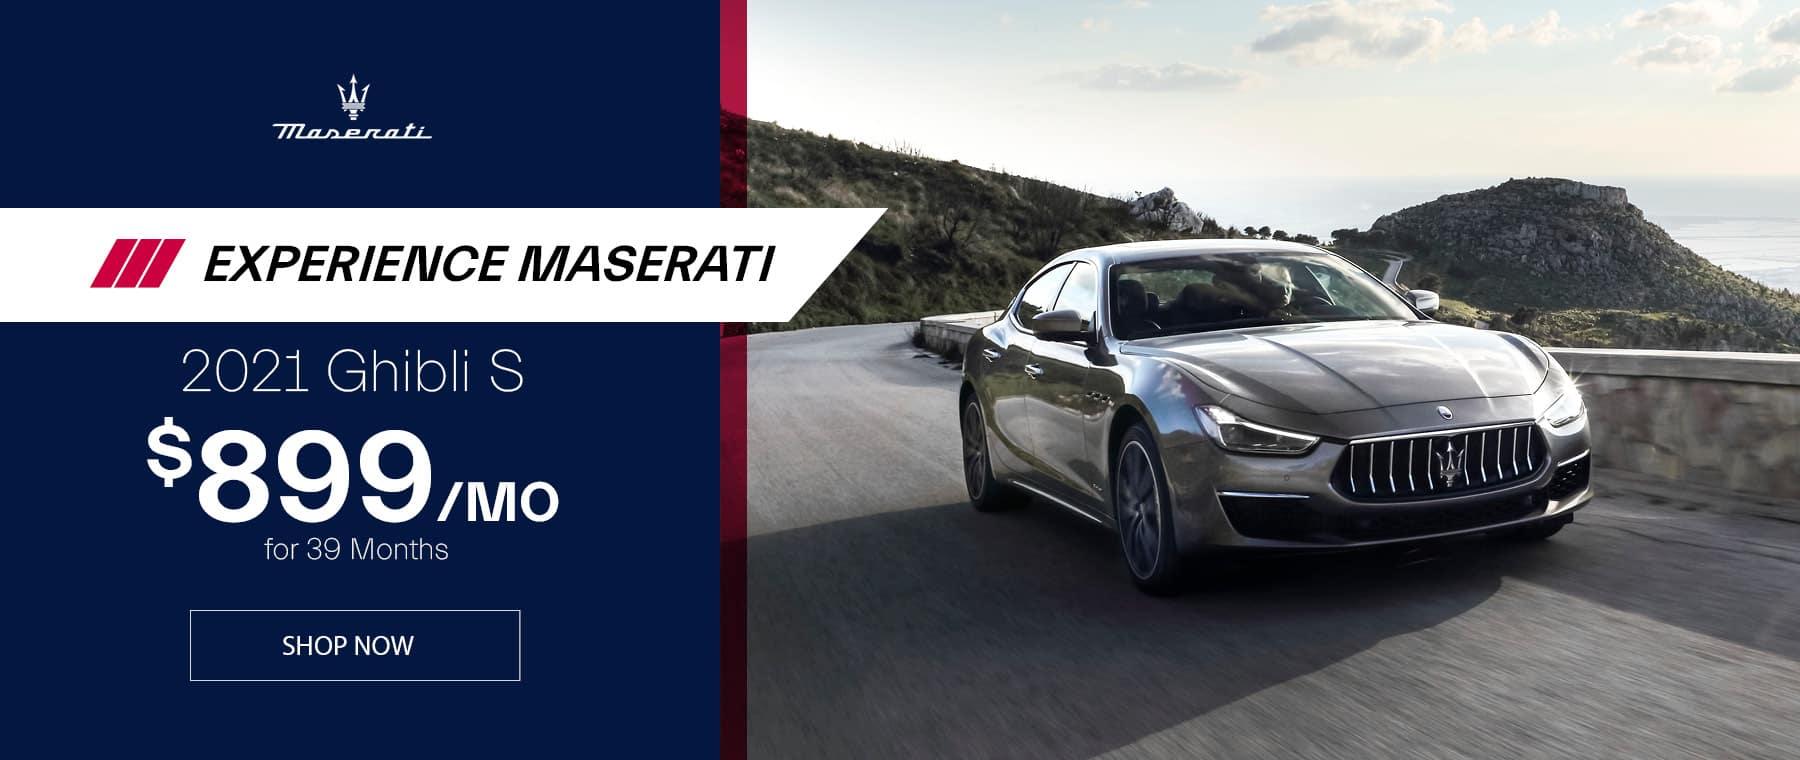 Silver 2021 Maserati Ghibli